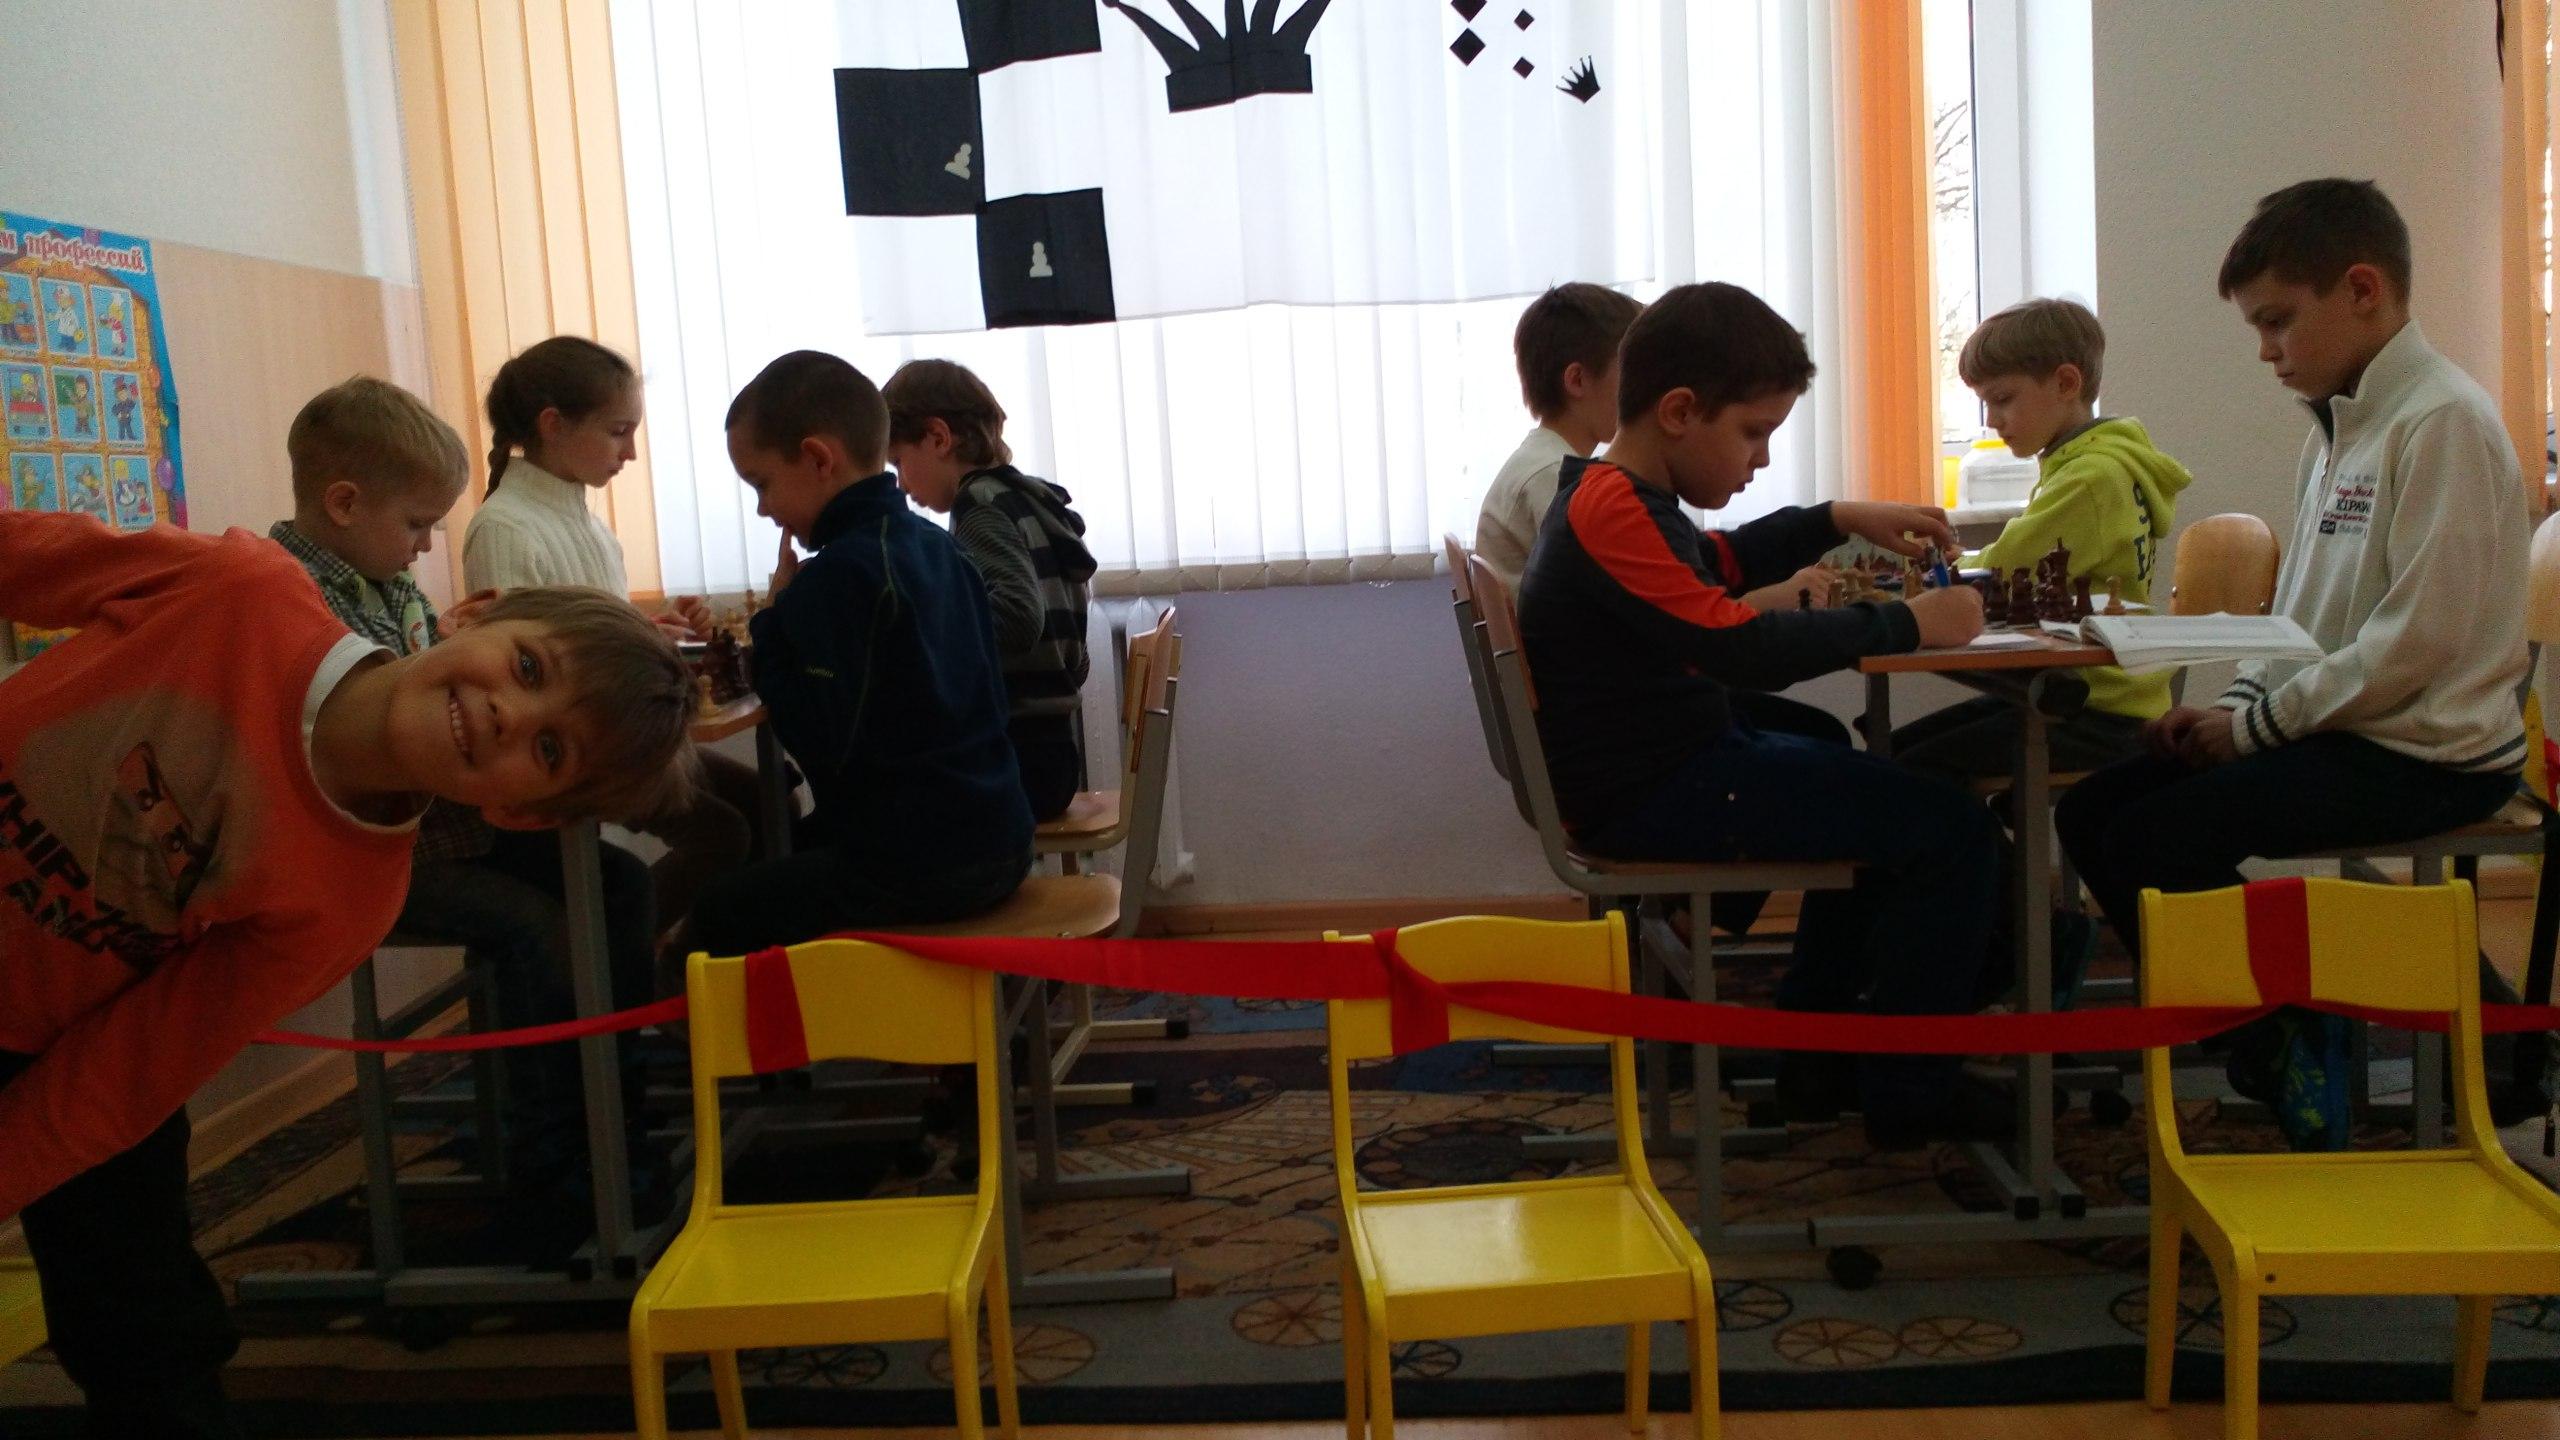 шахматисты за работой